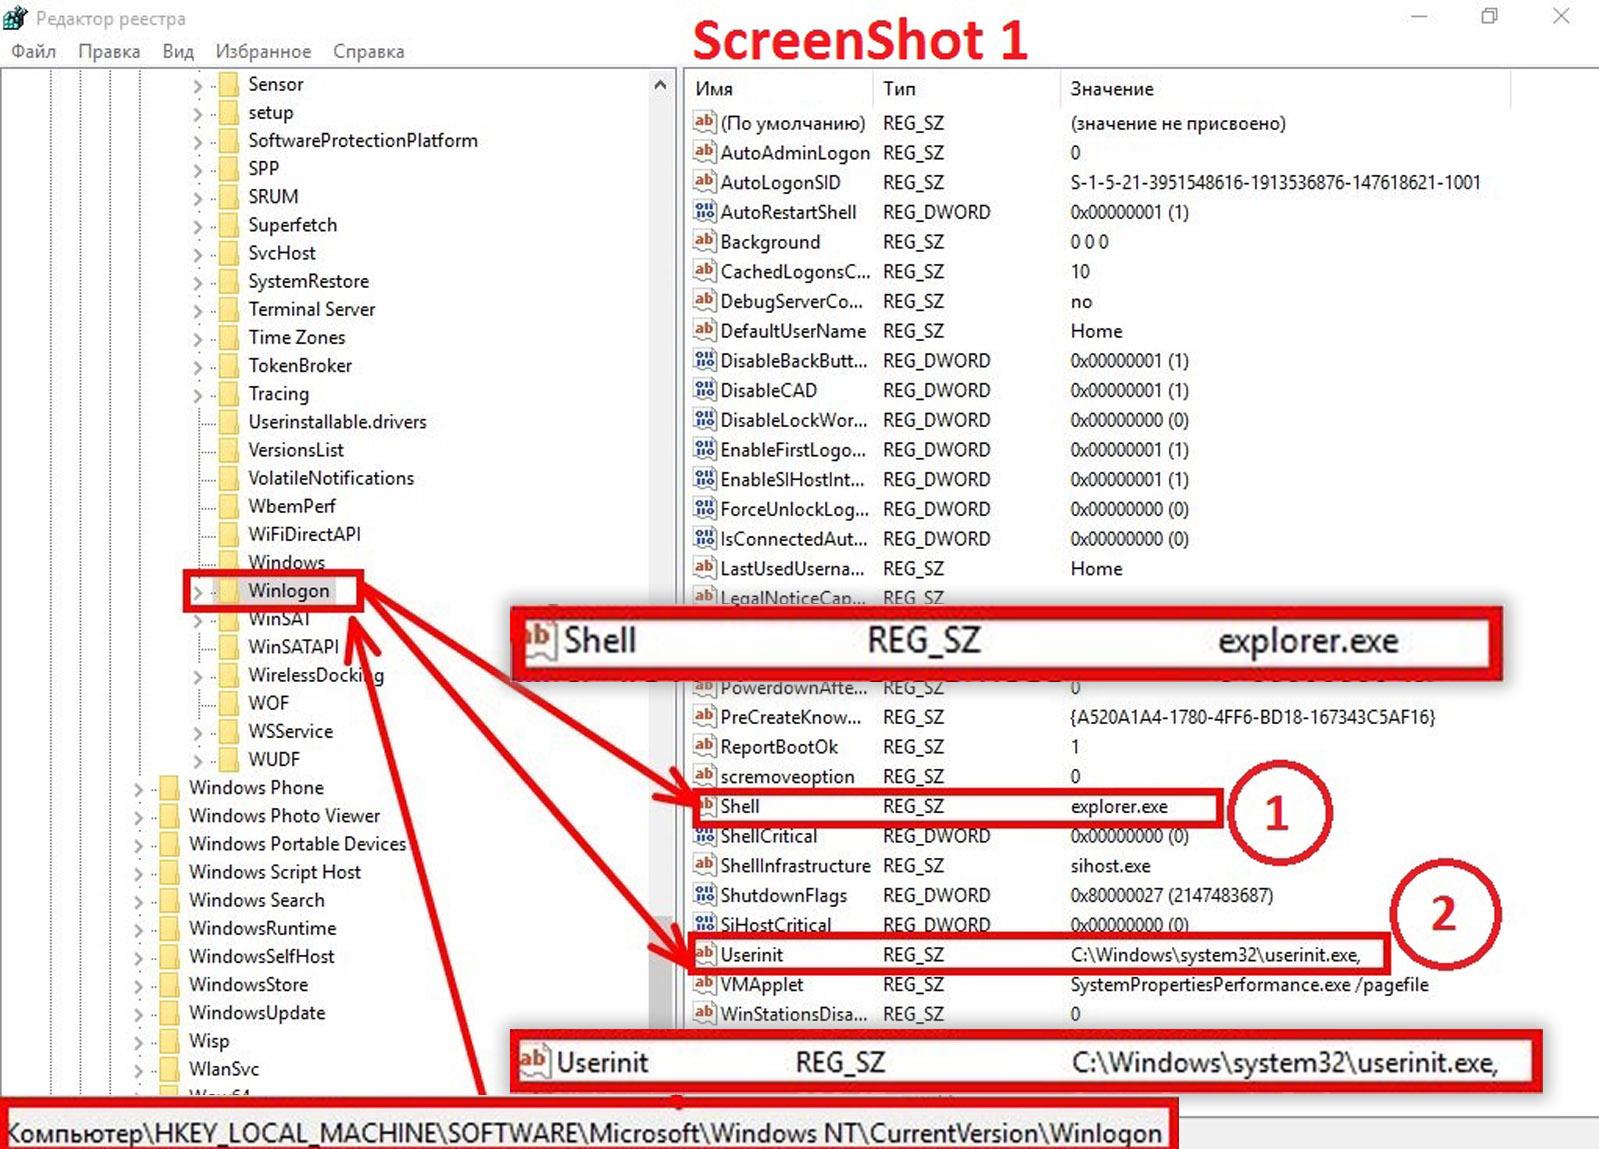 Проверка SHell и Userinit в реестре